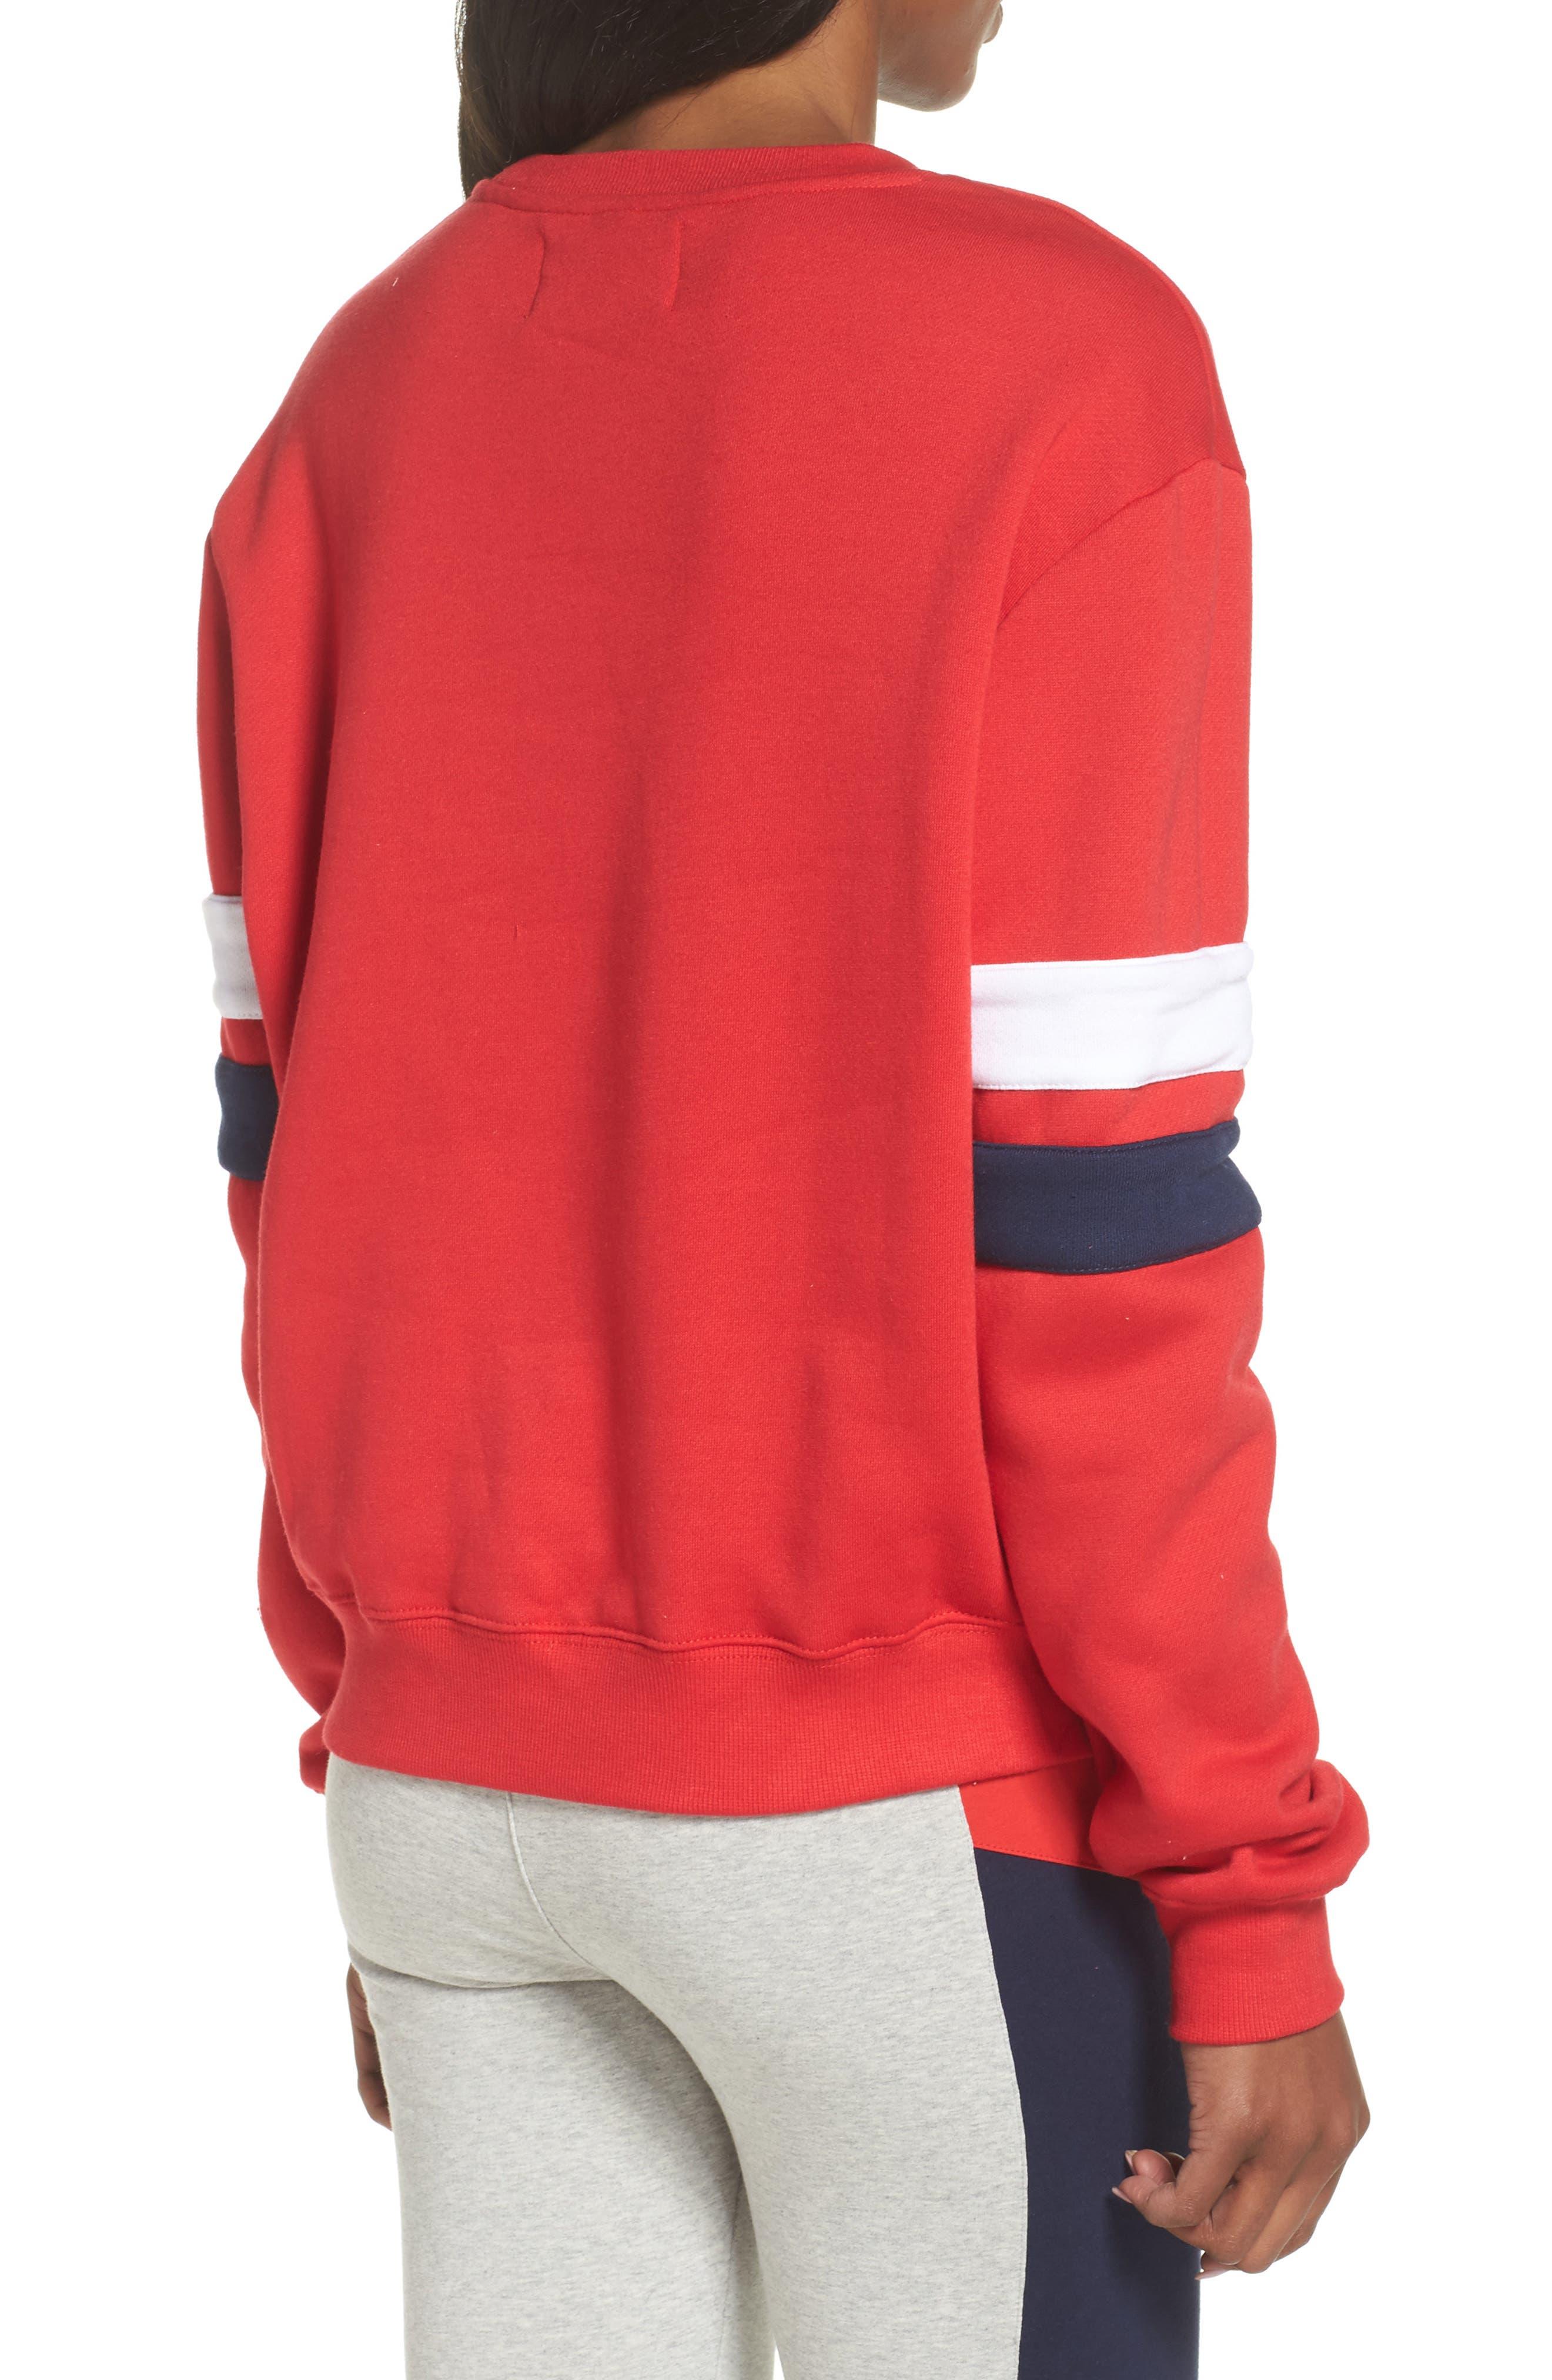 Newton Sweatshirt,                             Alternate thumbnail 8, color,